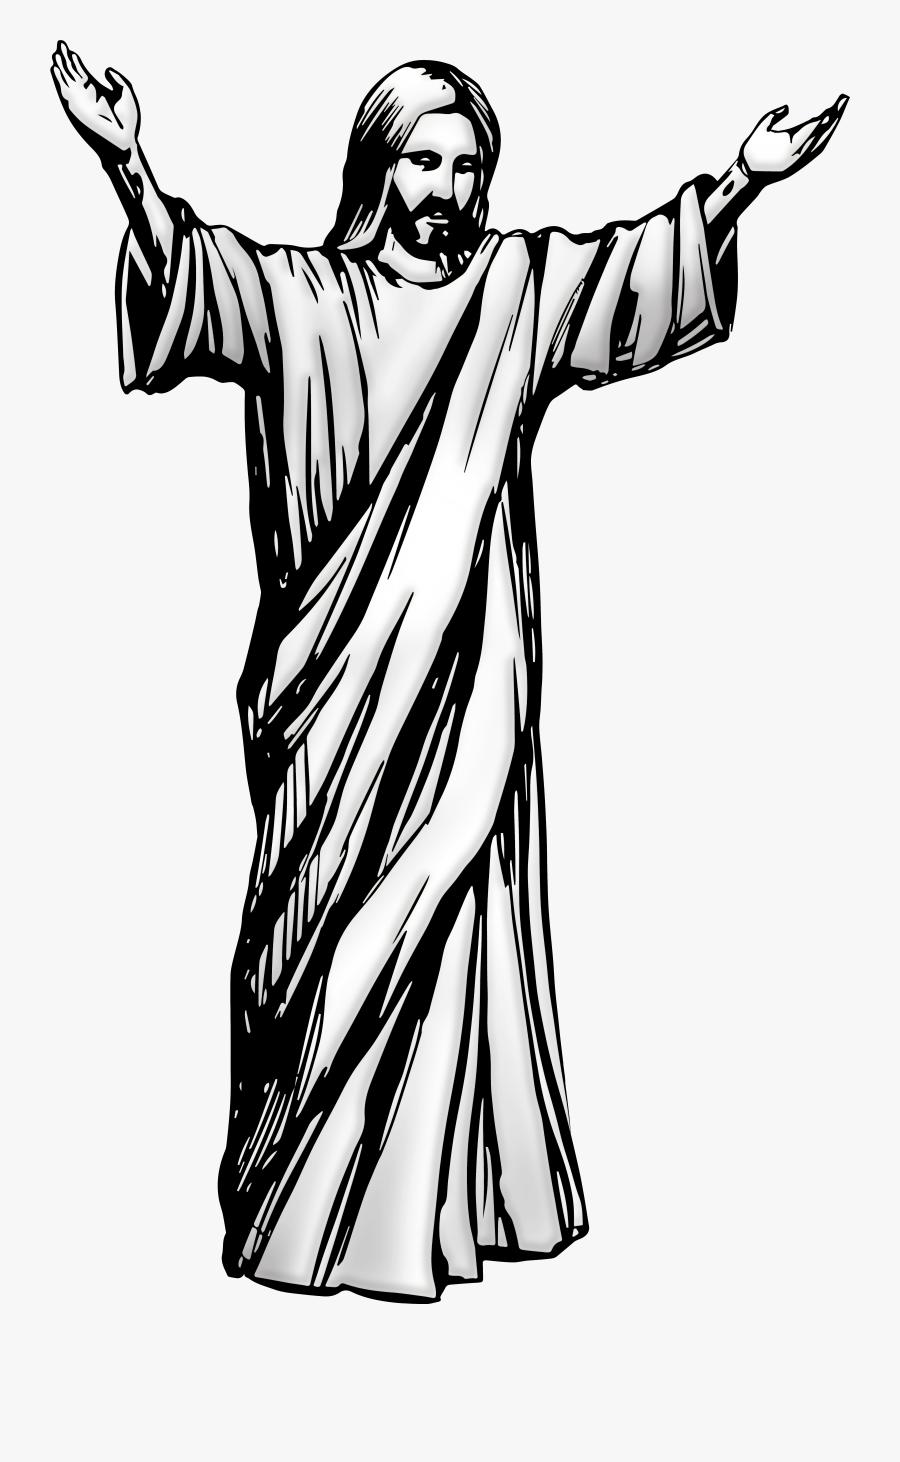 Jesus Christ Png Clip Art - Black And White Jesus, Transparent Clipart